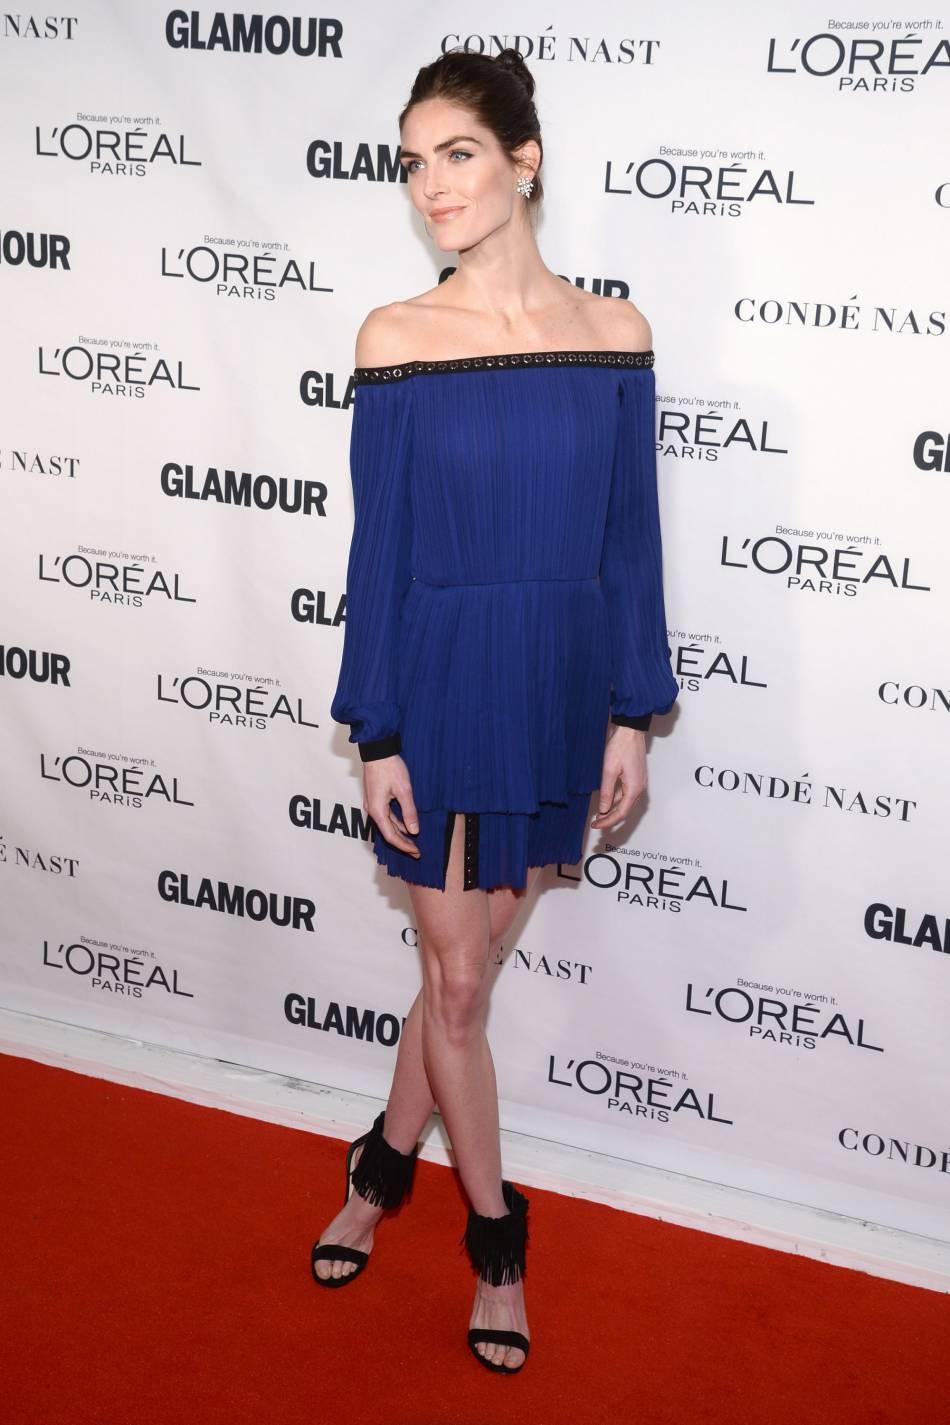 Hilary Rhoda aux Glamour Awards le 9 novembre 2015 à New York.